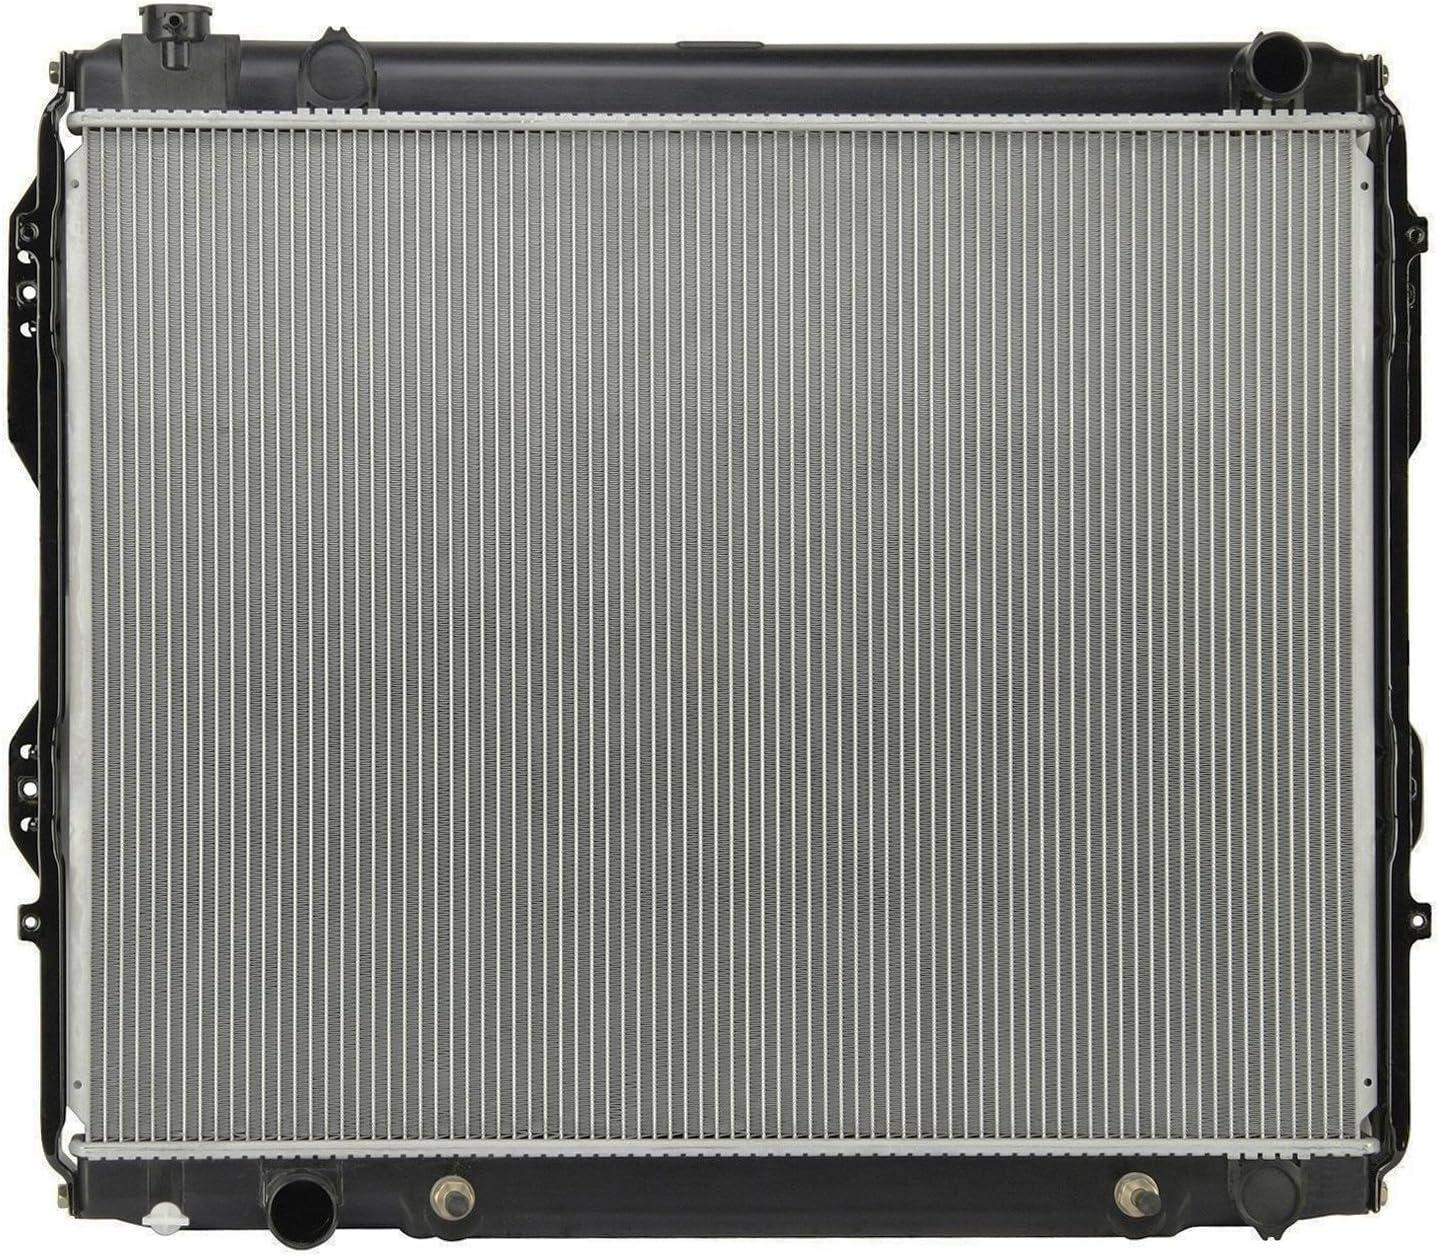 Amazon Com Sunbelt Radiator For Toyota Tundra 2320 Automotive